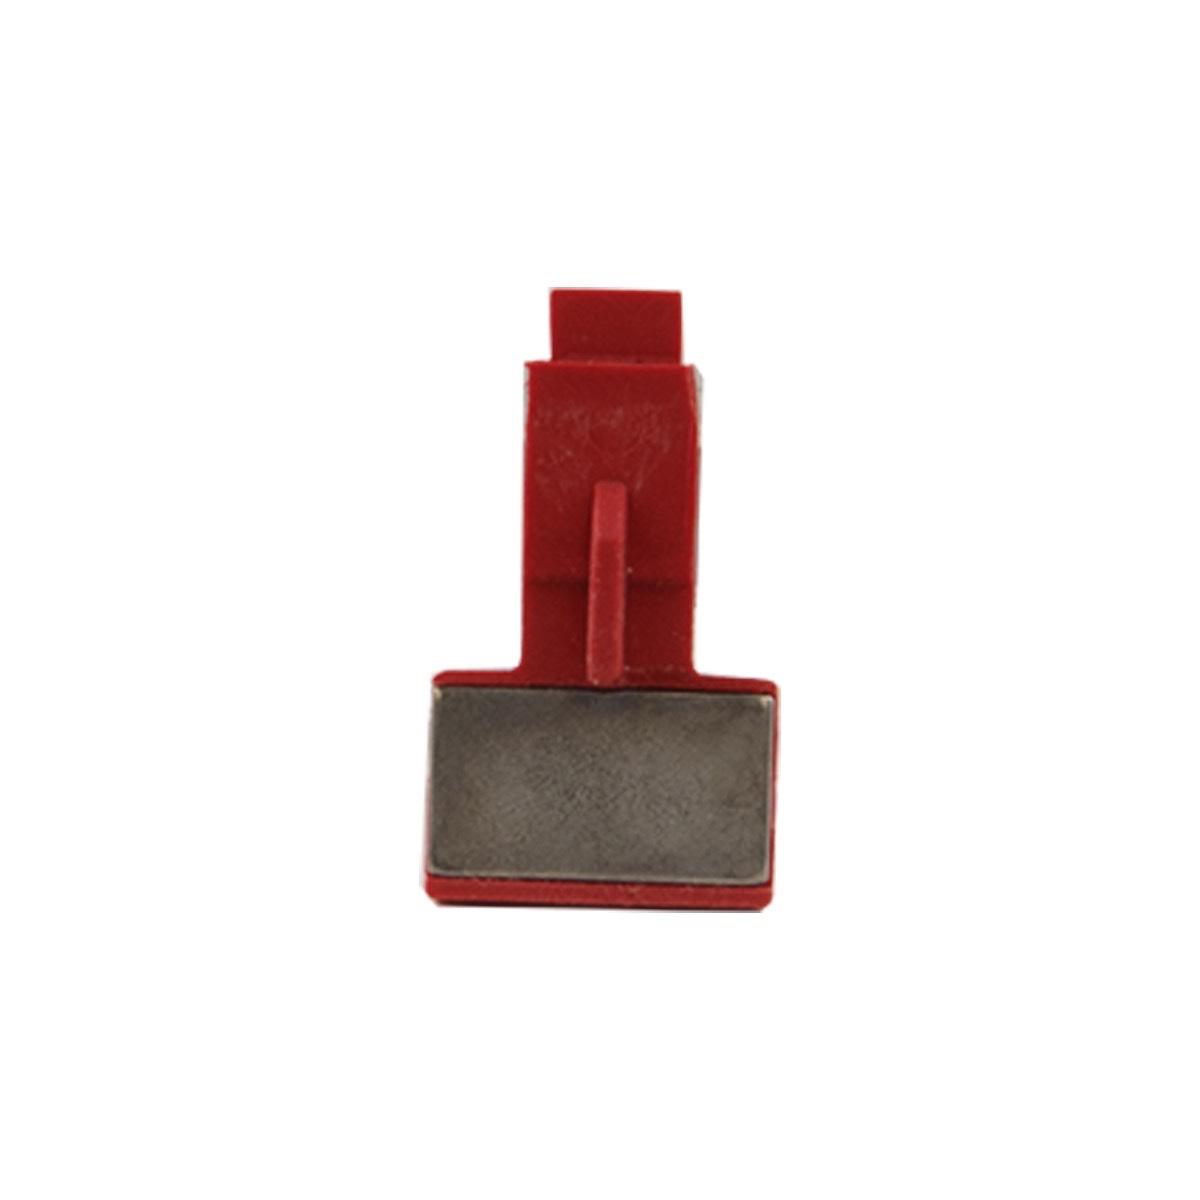 8008-0036, Pressure Shaft Block